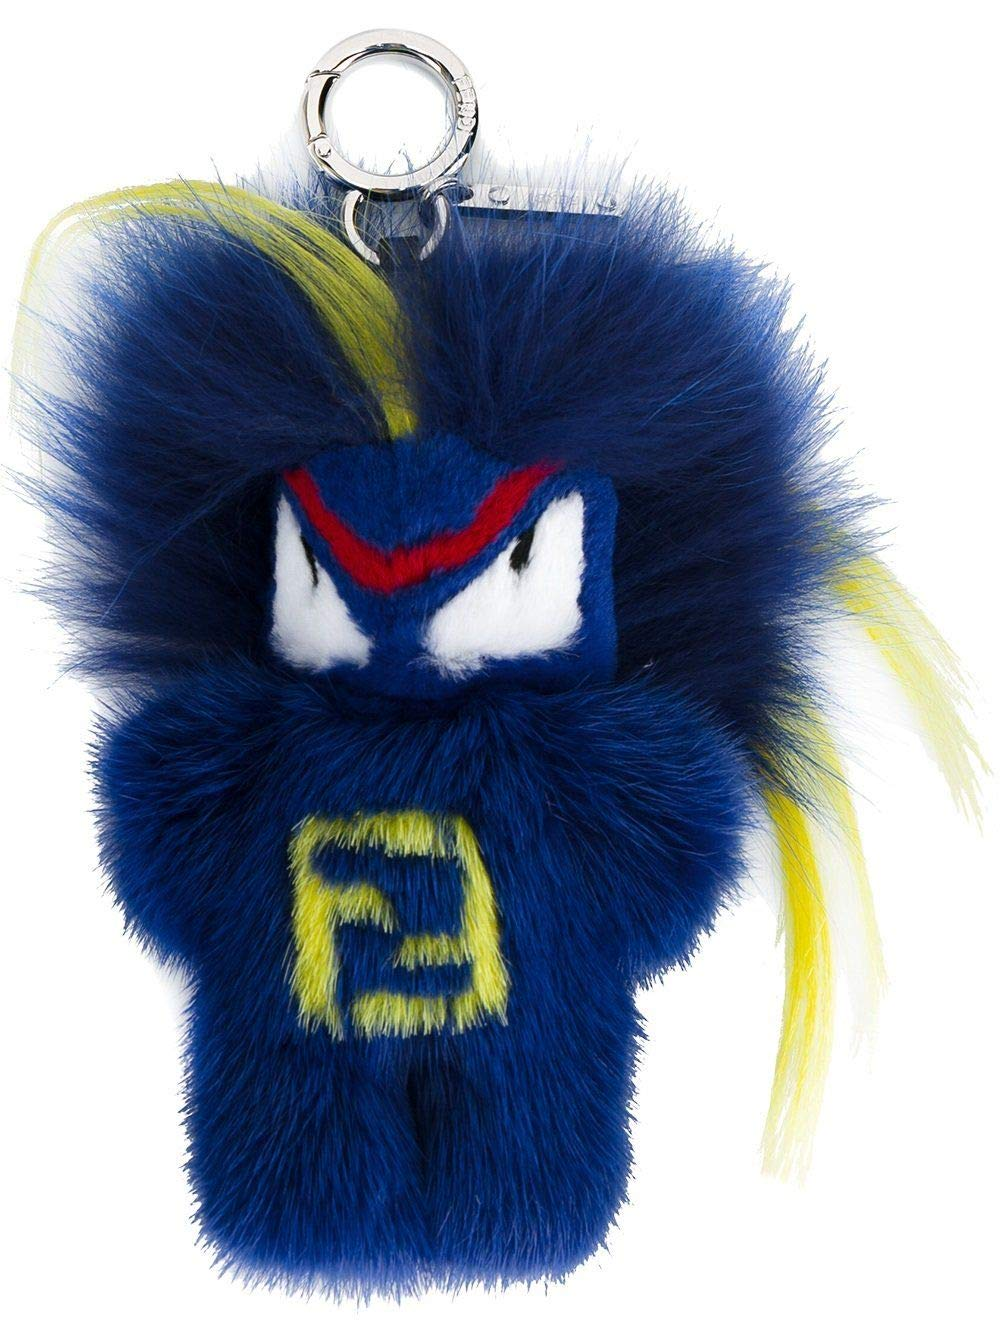 Fendi Women's 7Ar5249cjf05xg-Mcf Blue Leather Key Chain